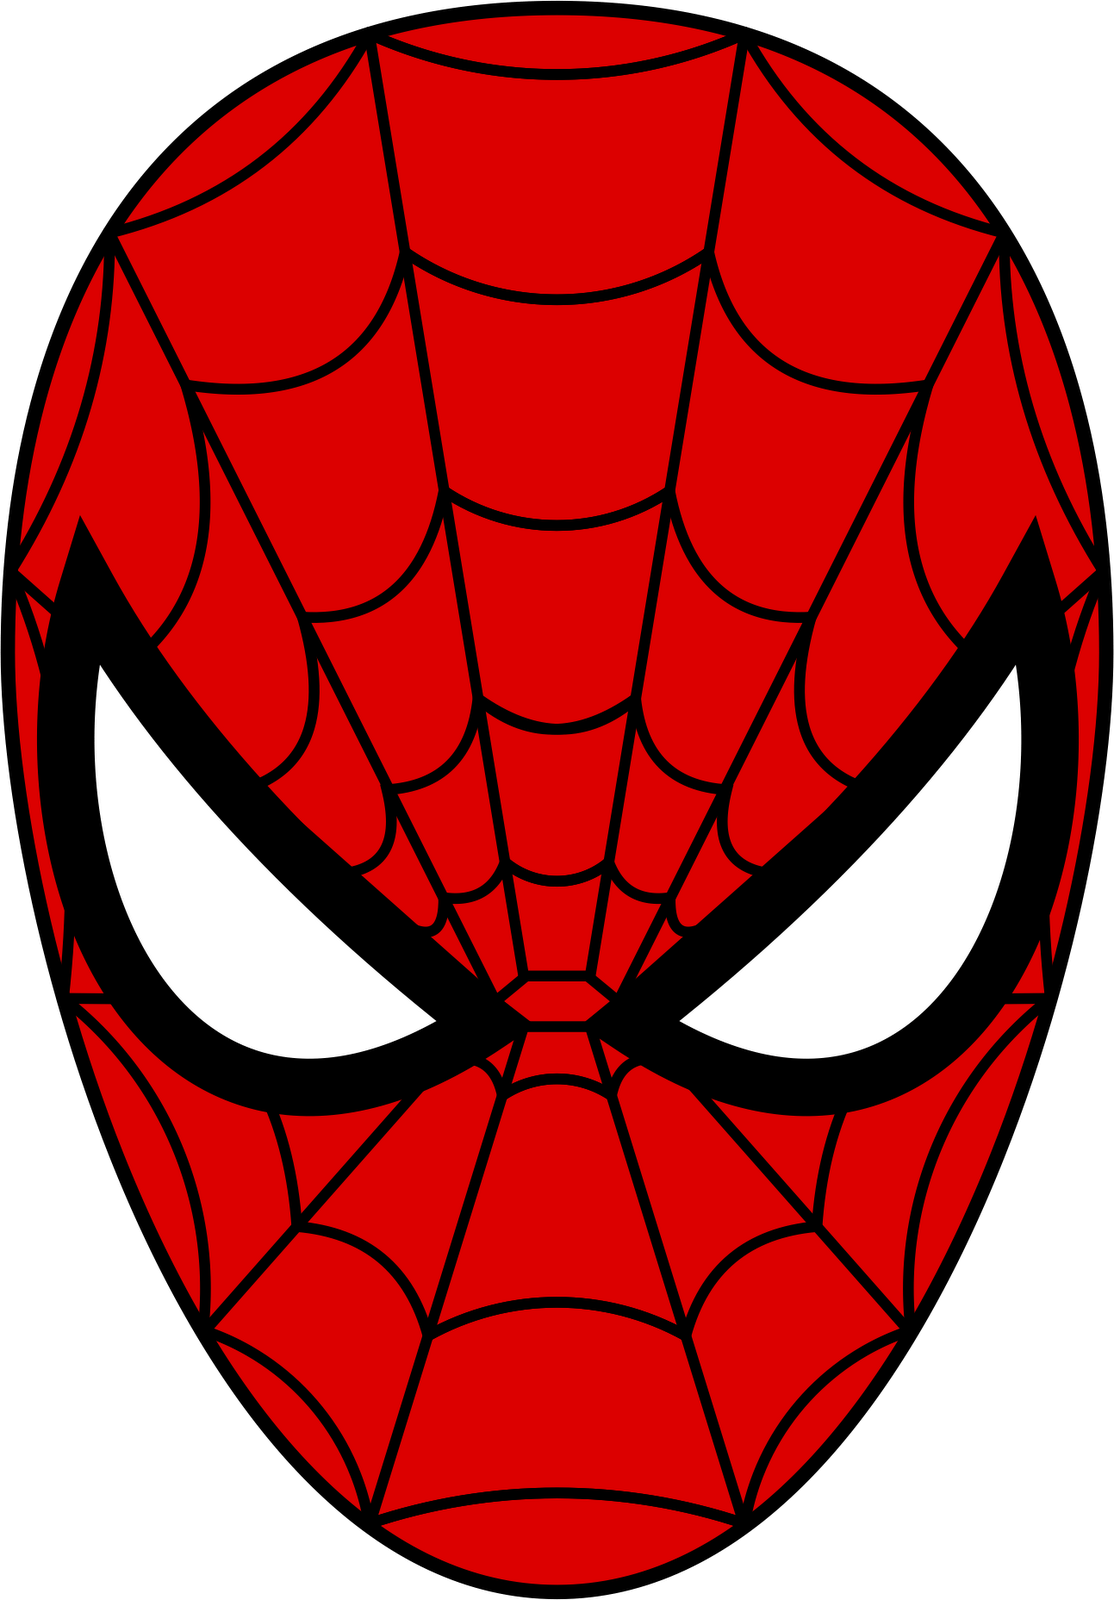 Comics And Fantasy · Spiderman - Spiderman, Transparent background PNG HD thumbnail